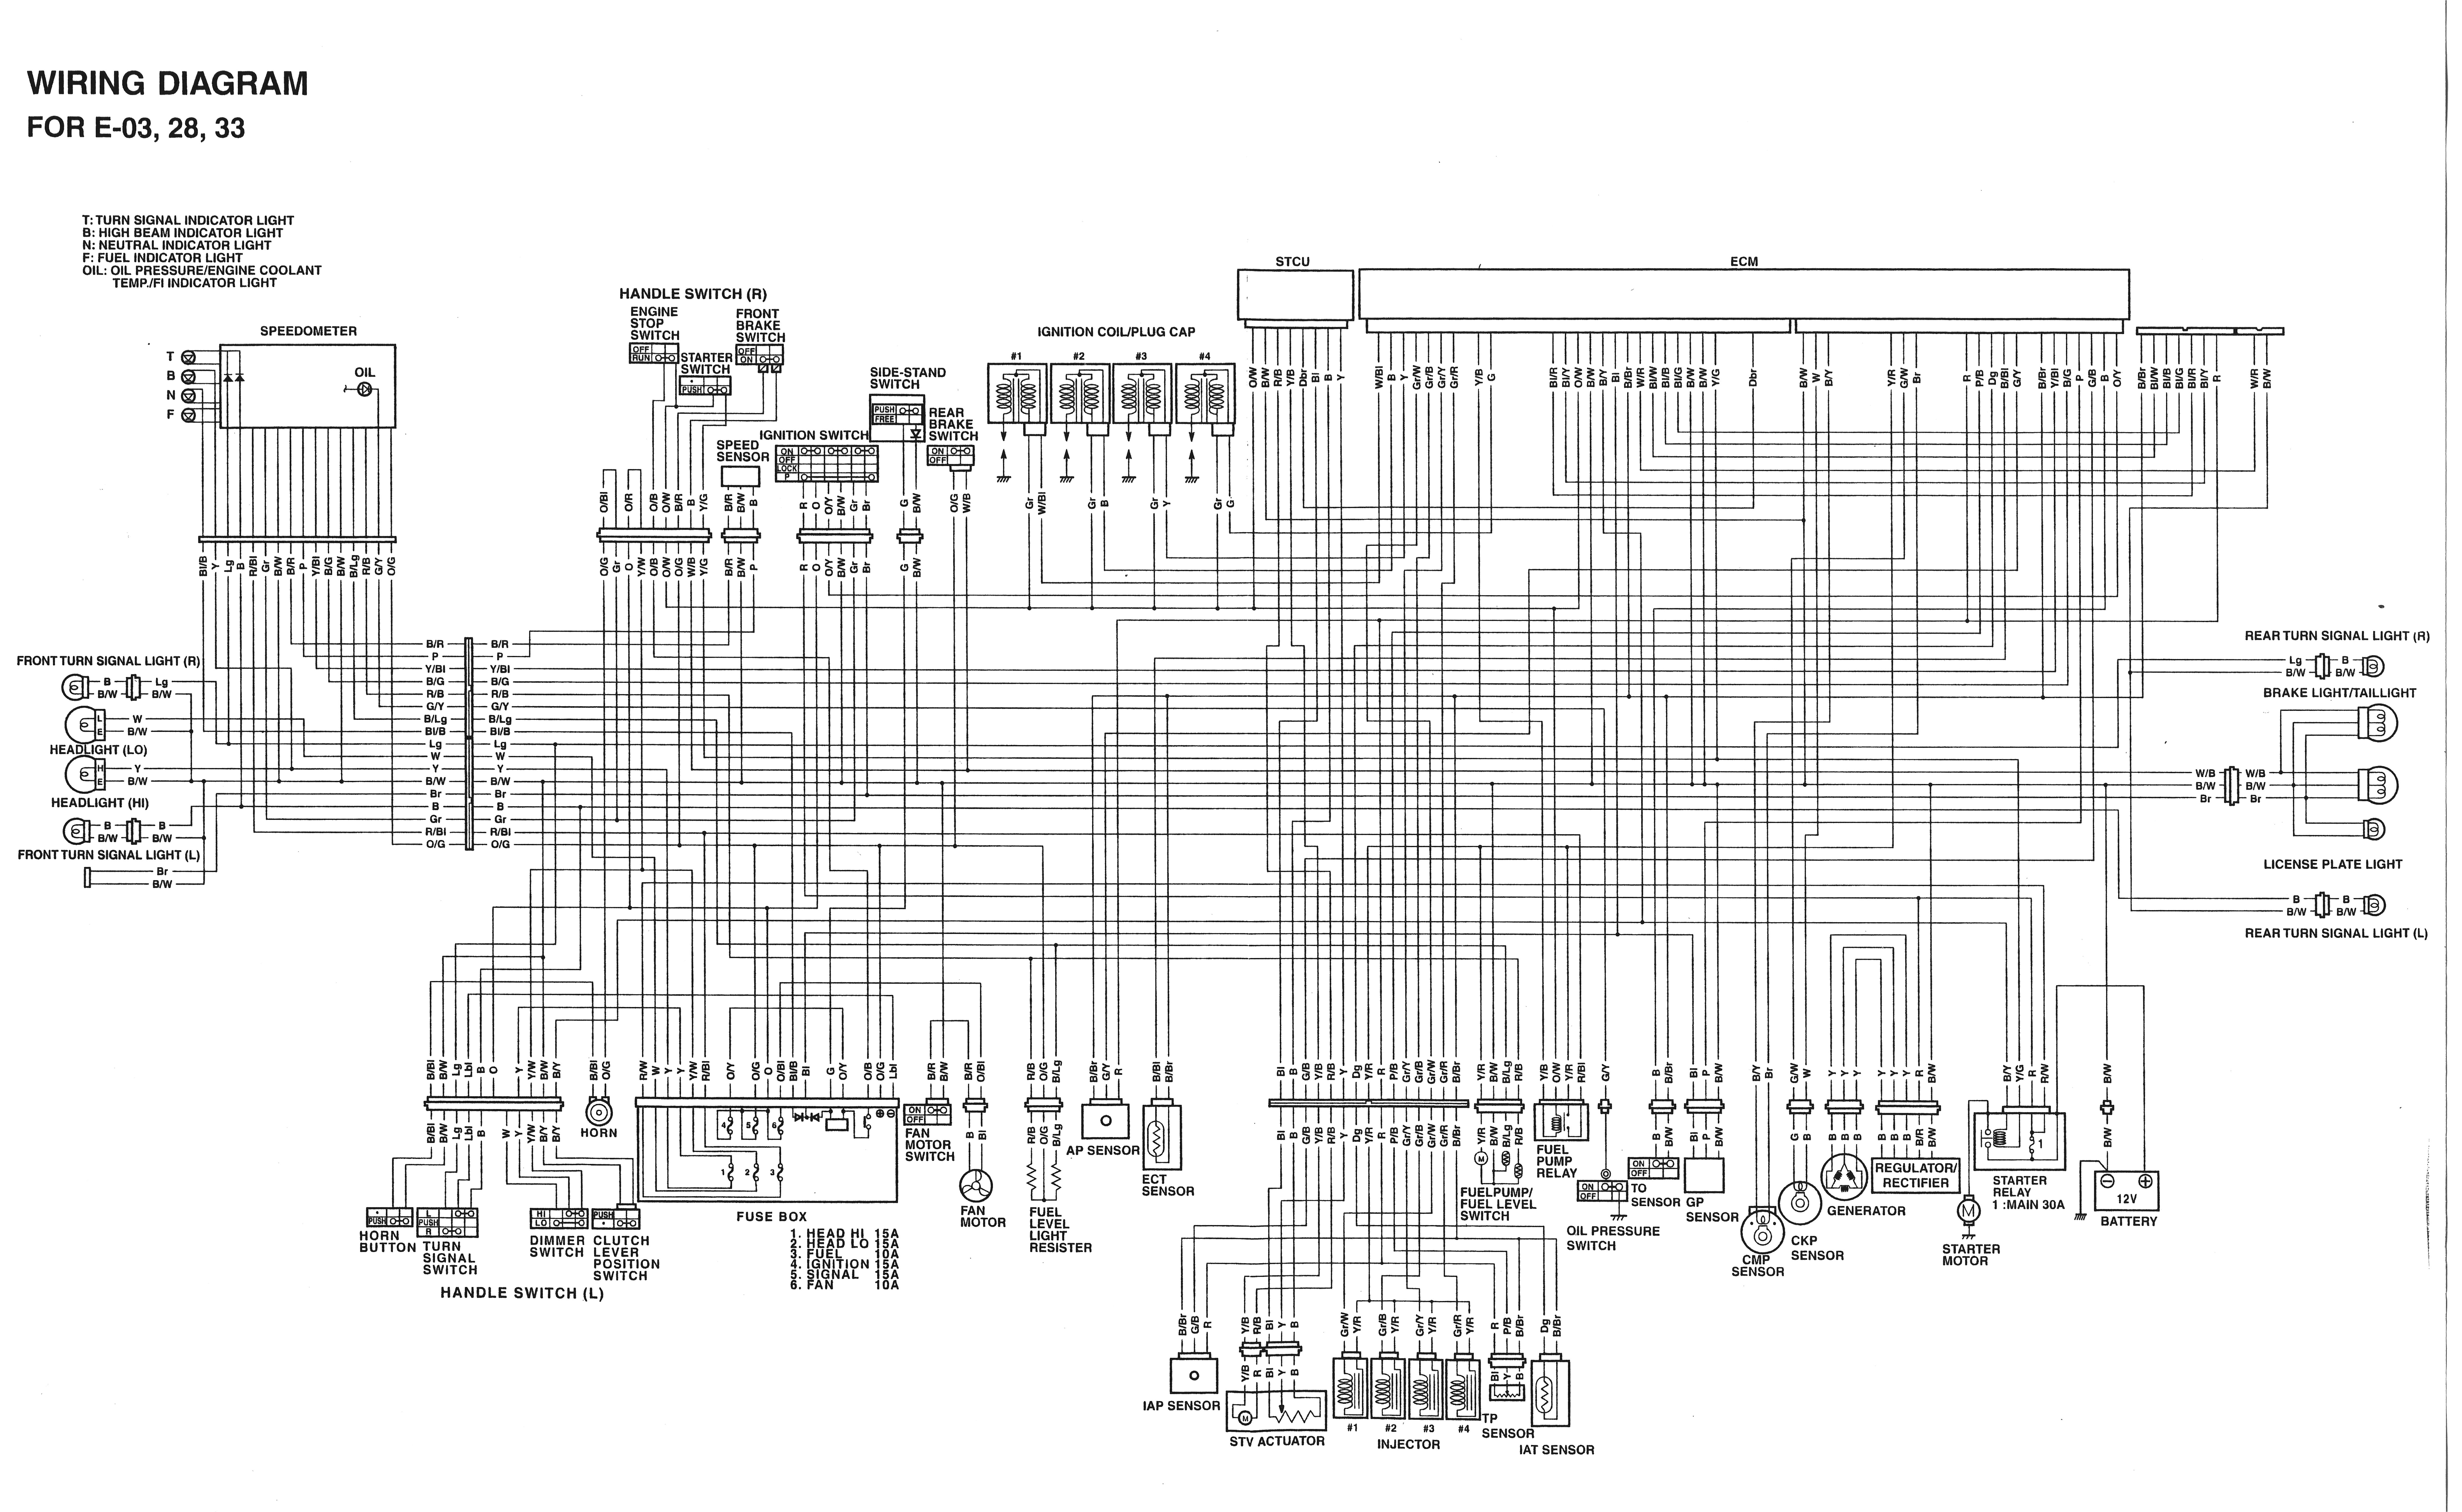 1997 gsxr wiring diagram wiring diagram expert1997 gsxr wiring diagram data wiring diagram 1997 suzuki gsxr